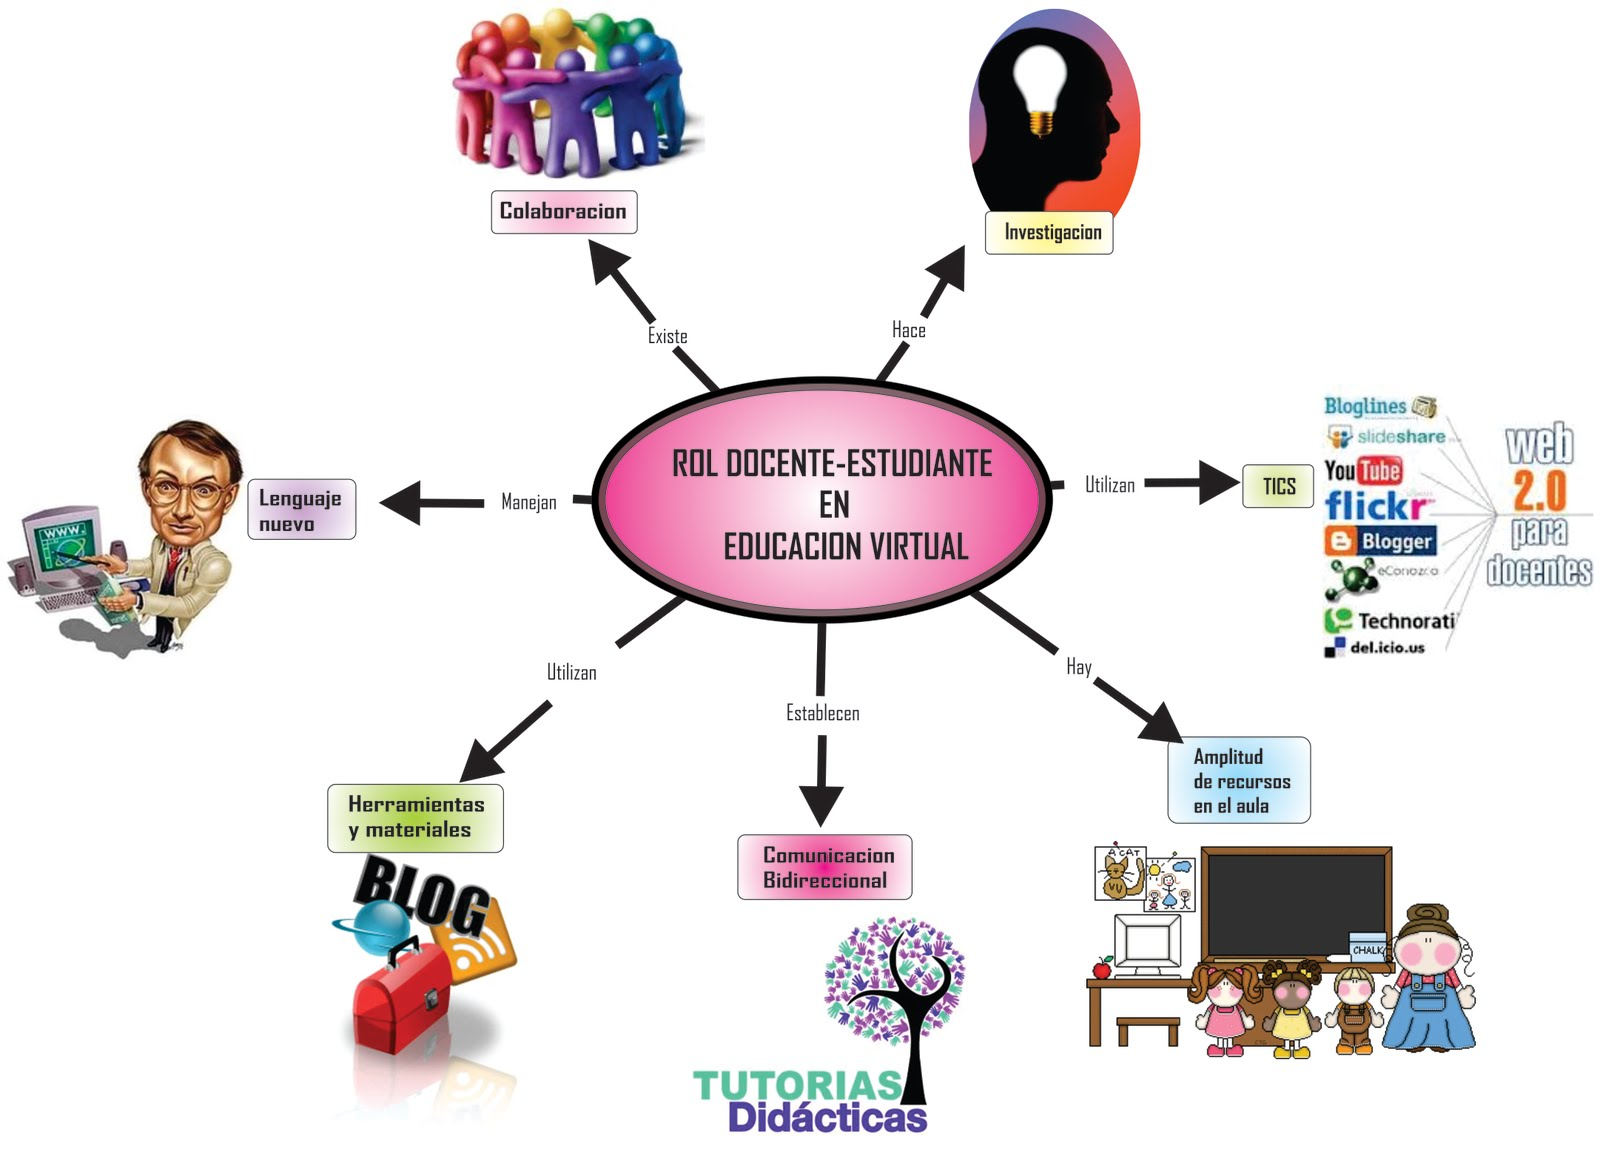 educacion virtual caracteristica: